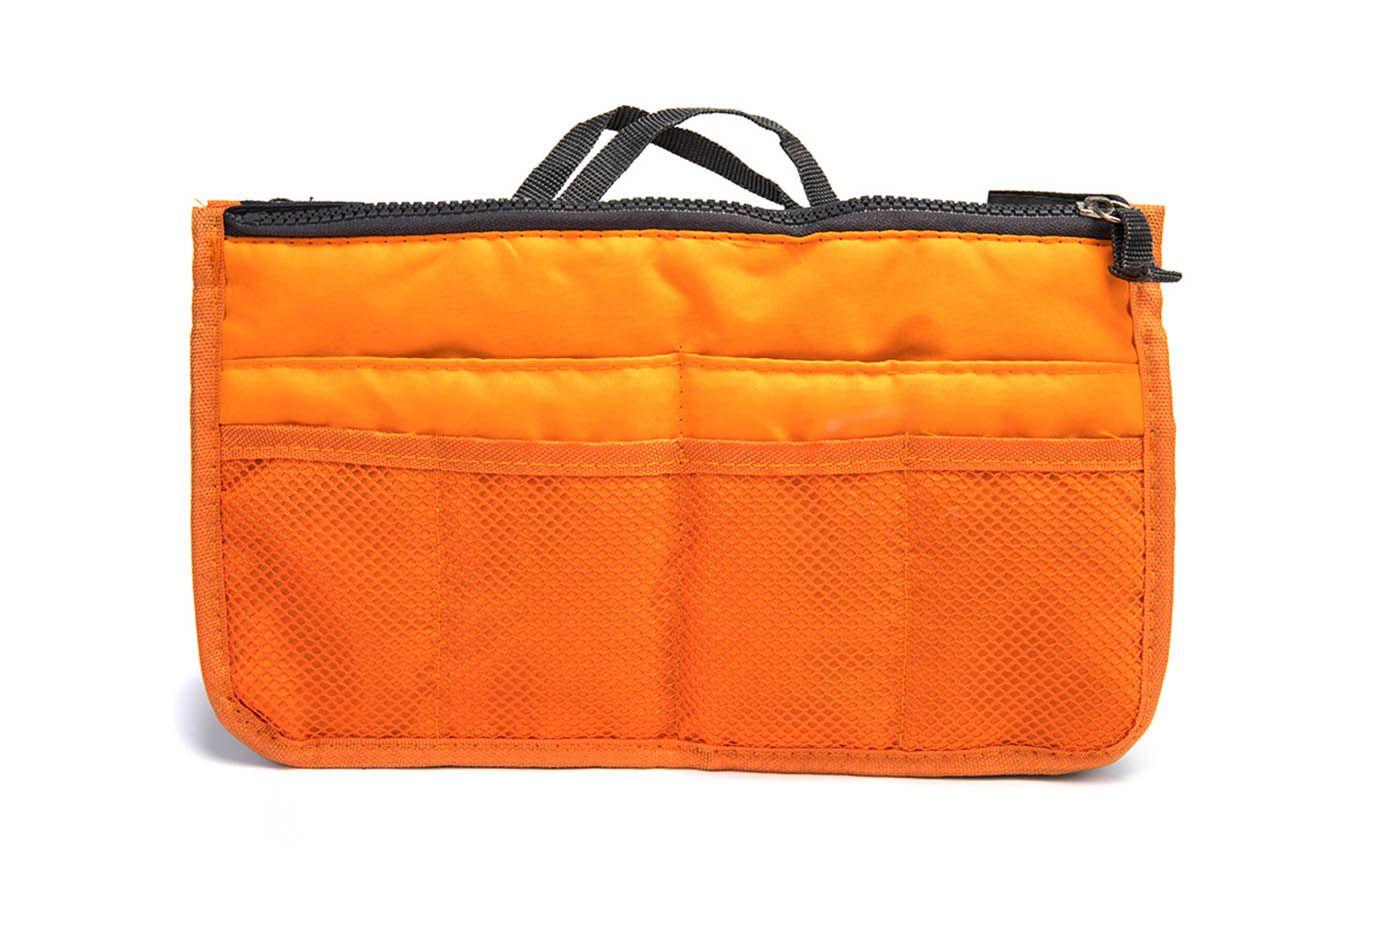 Сумка-органайзер Bradex TD 0504, оранжевый аксессуар органайзер bradex сумка в сумке grey td 0339